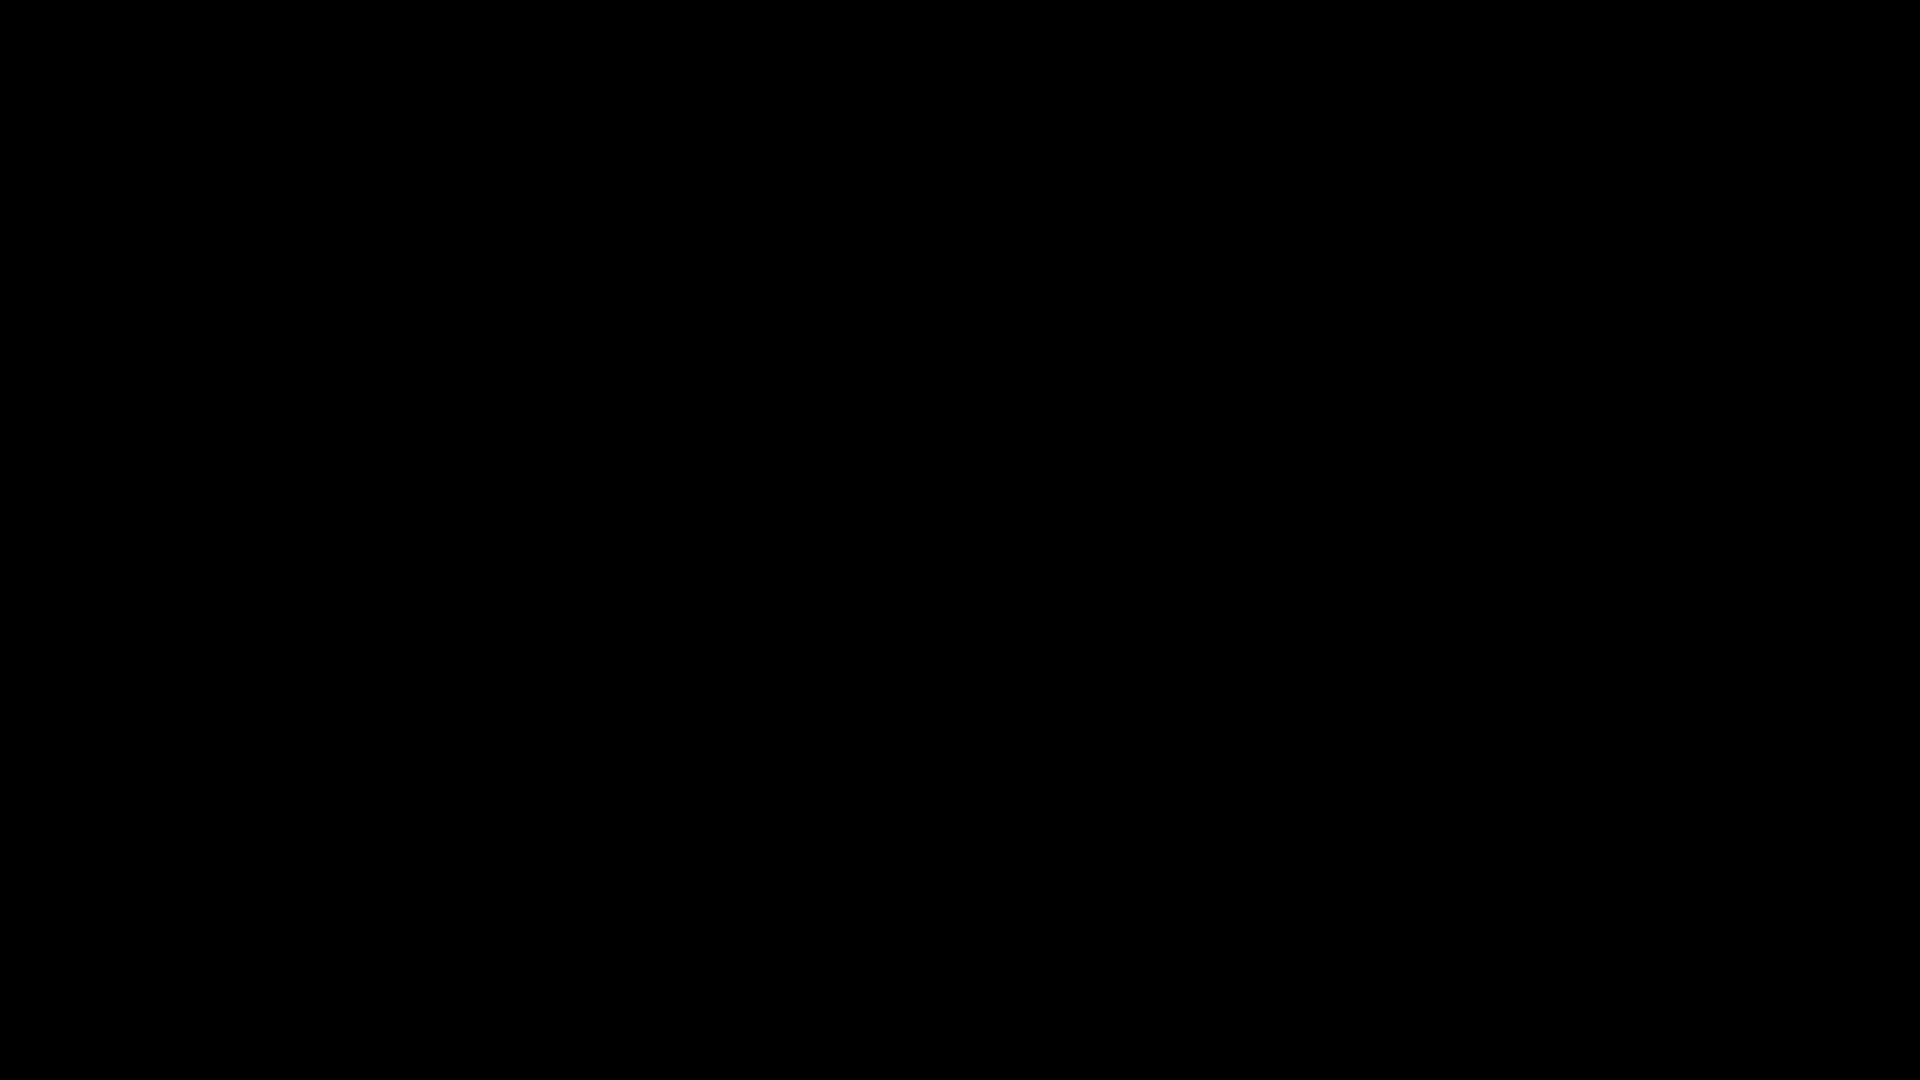 bullethell, gaming, roguelegacy, svp13_RL2 GIFs